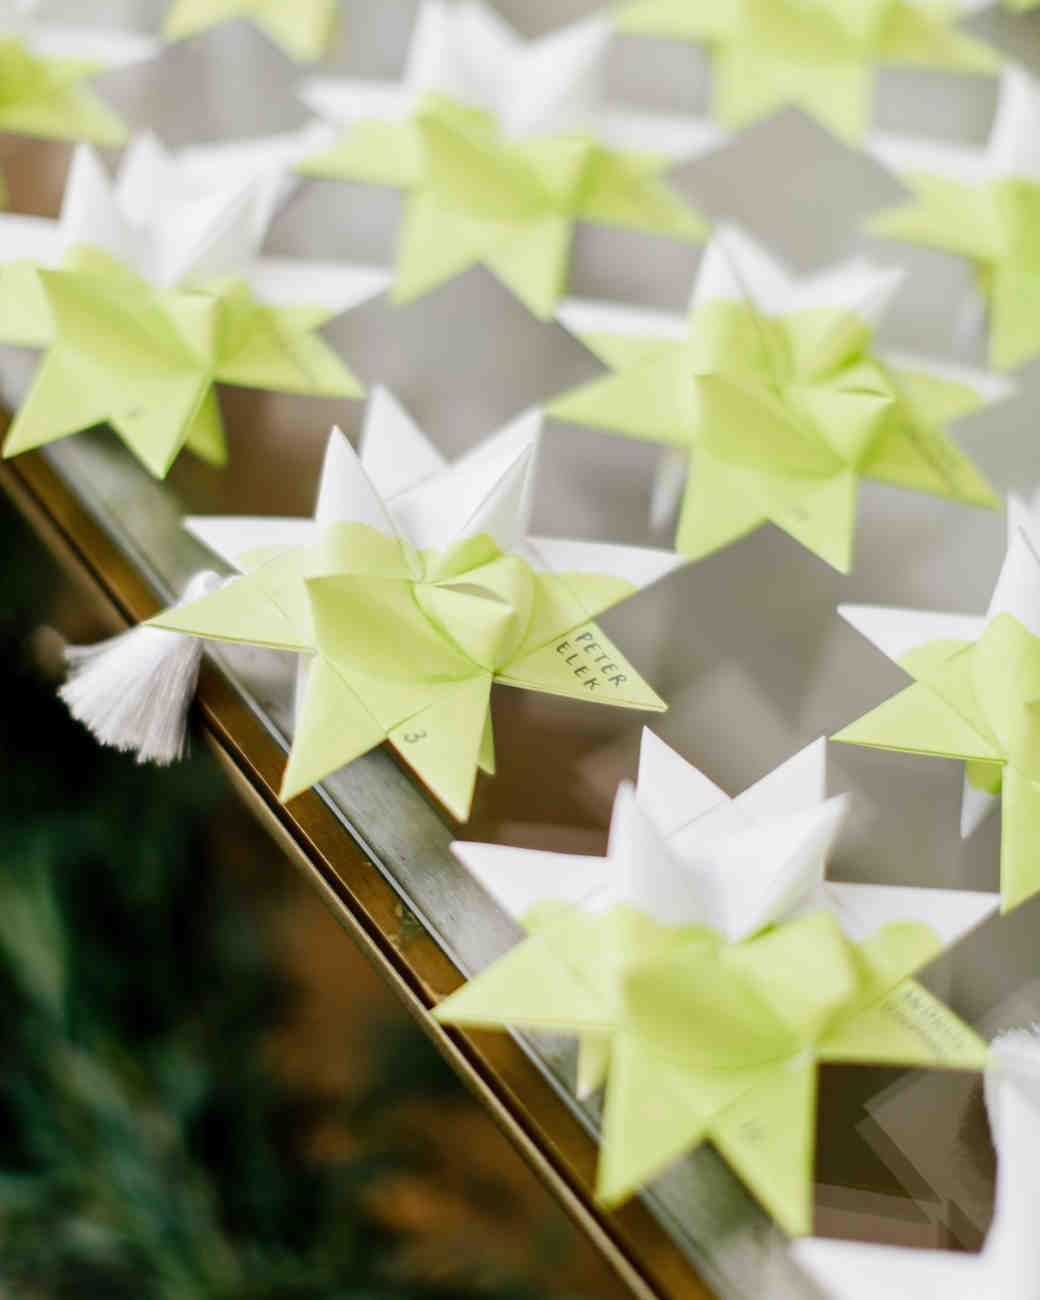 susan-tom-wedding-star-escortcards-199-s112692-0316.jpg